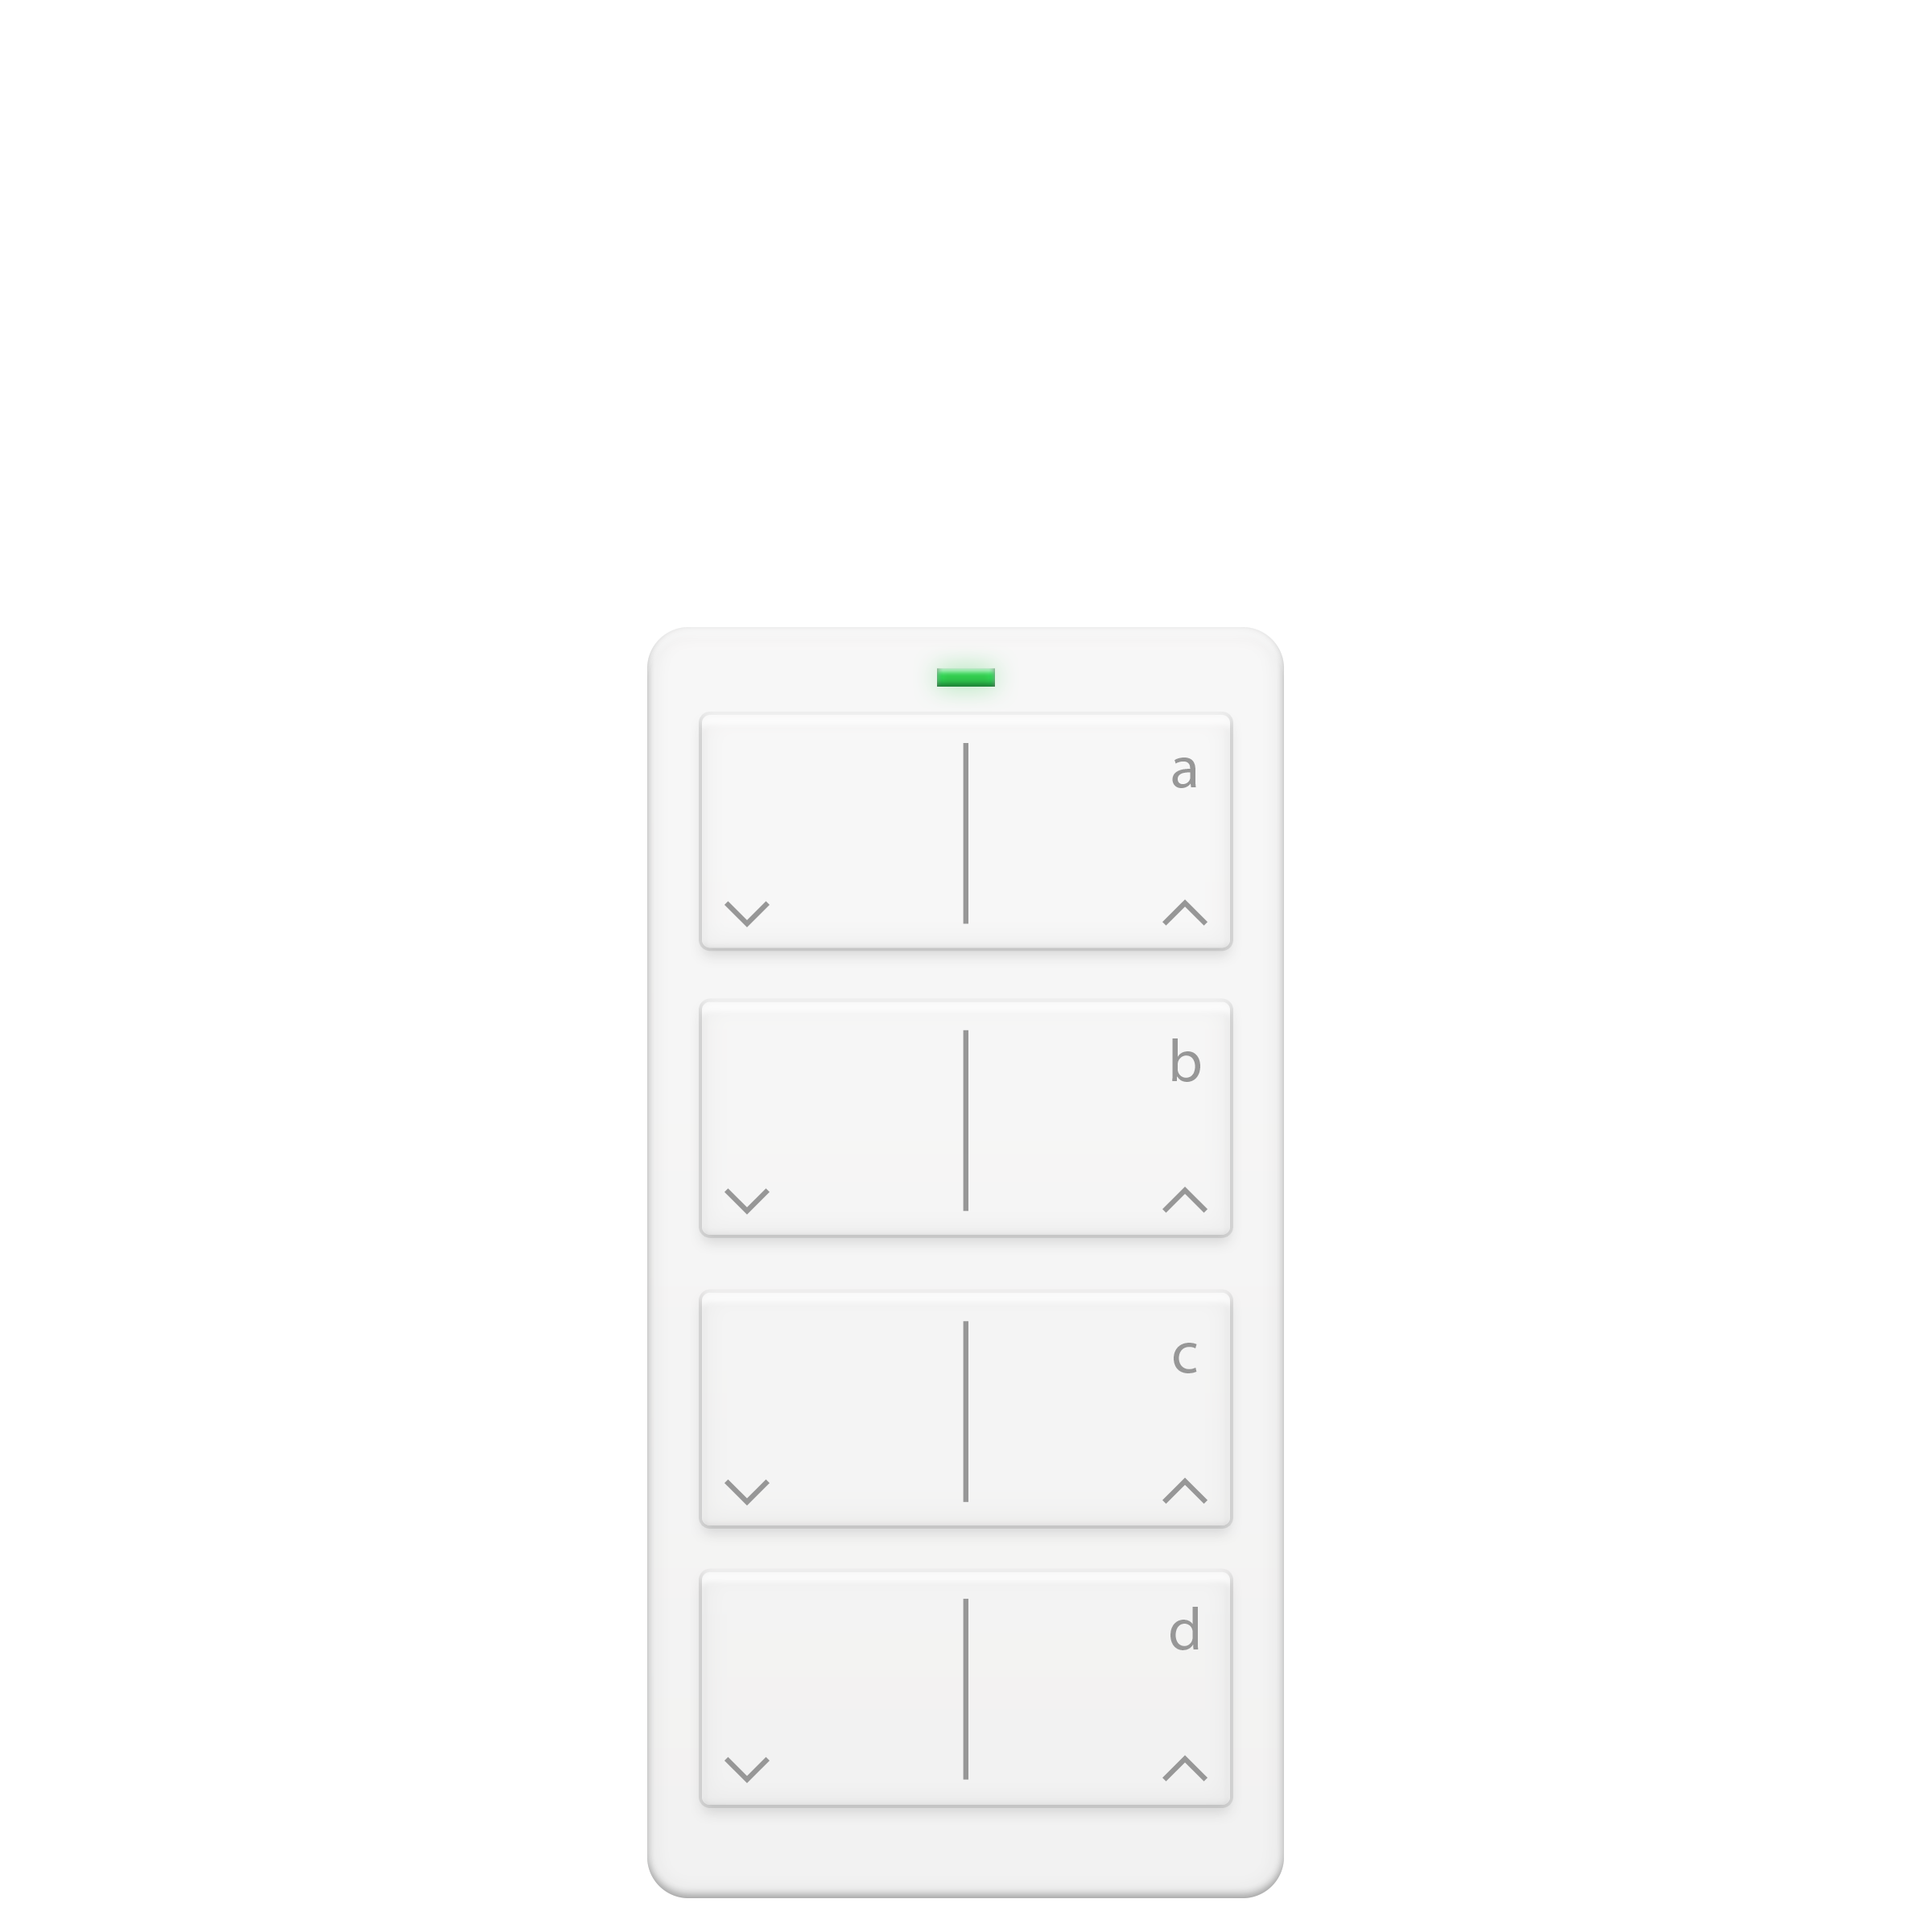 Mini Remote (4-Button) (Front).png